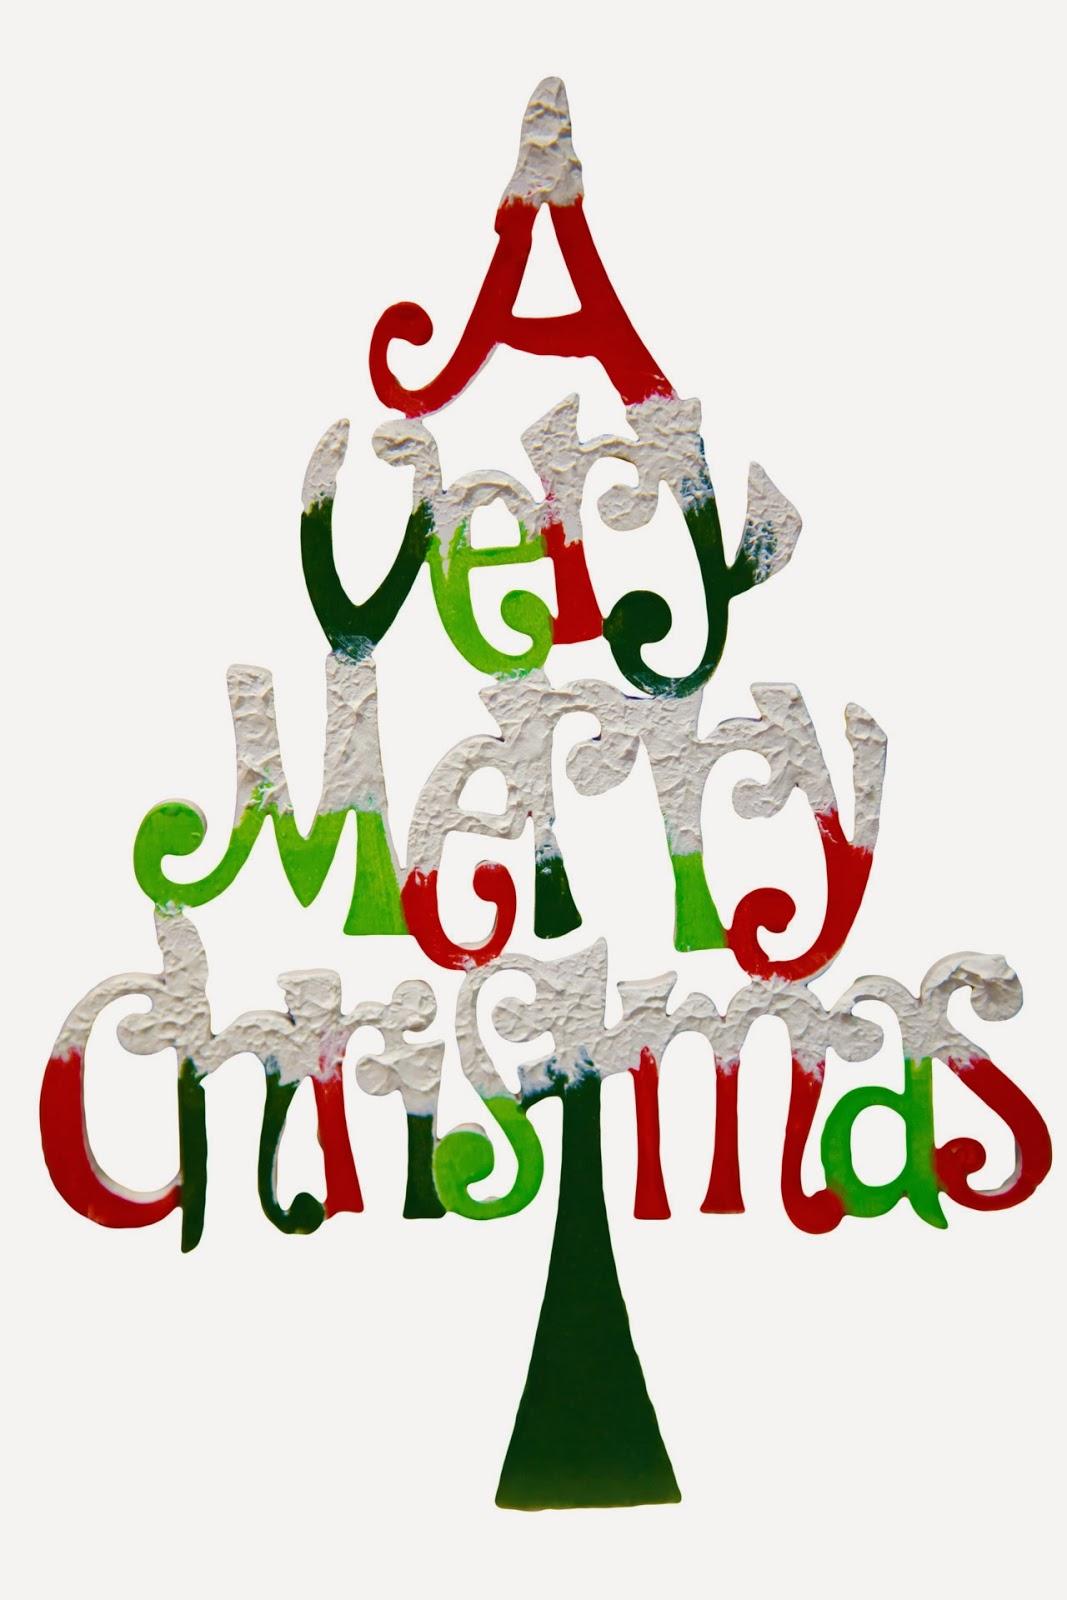 merry christmas tree wallpaper - merry christmas tree clip art - merry ...